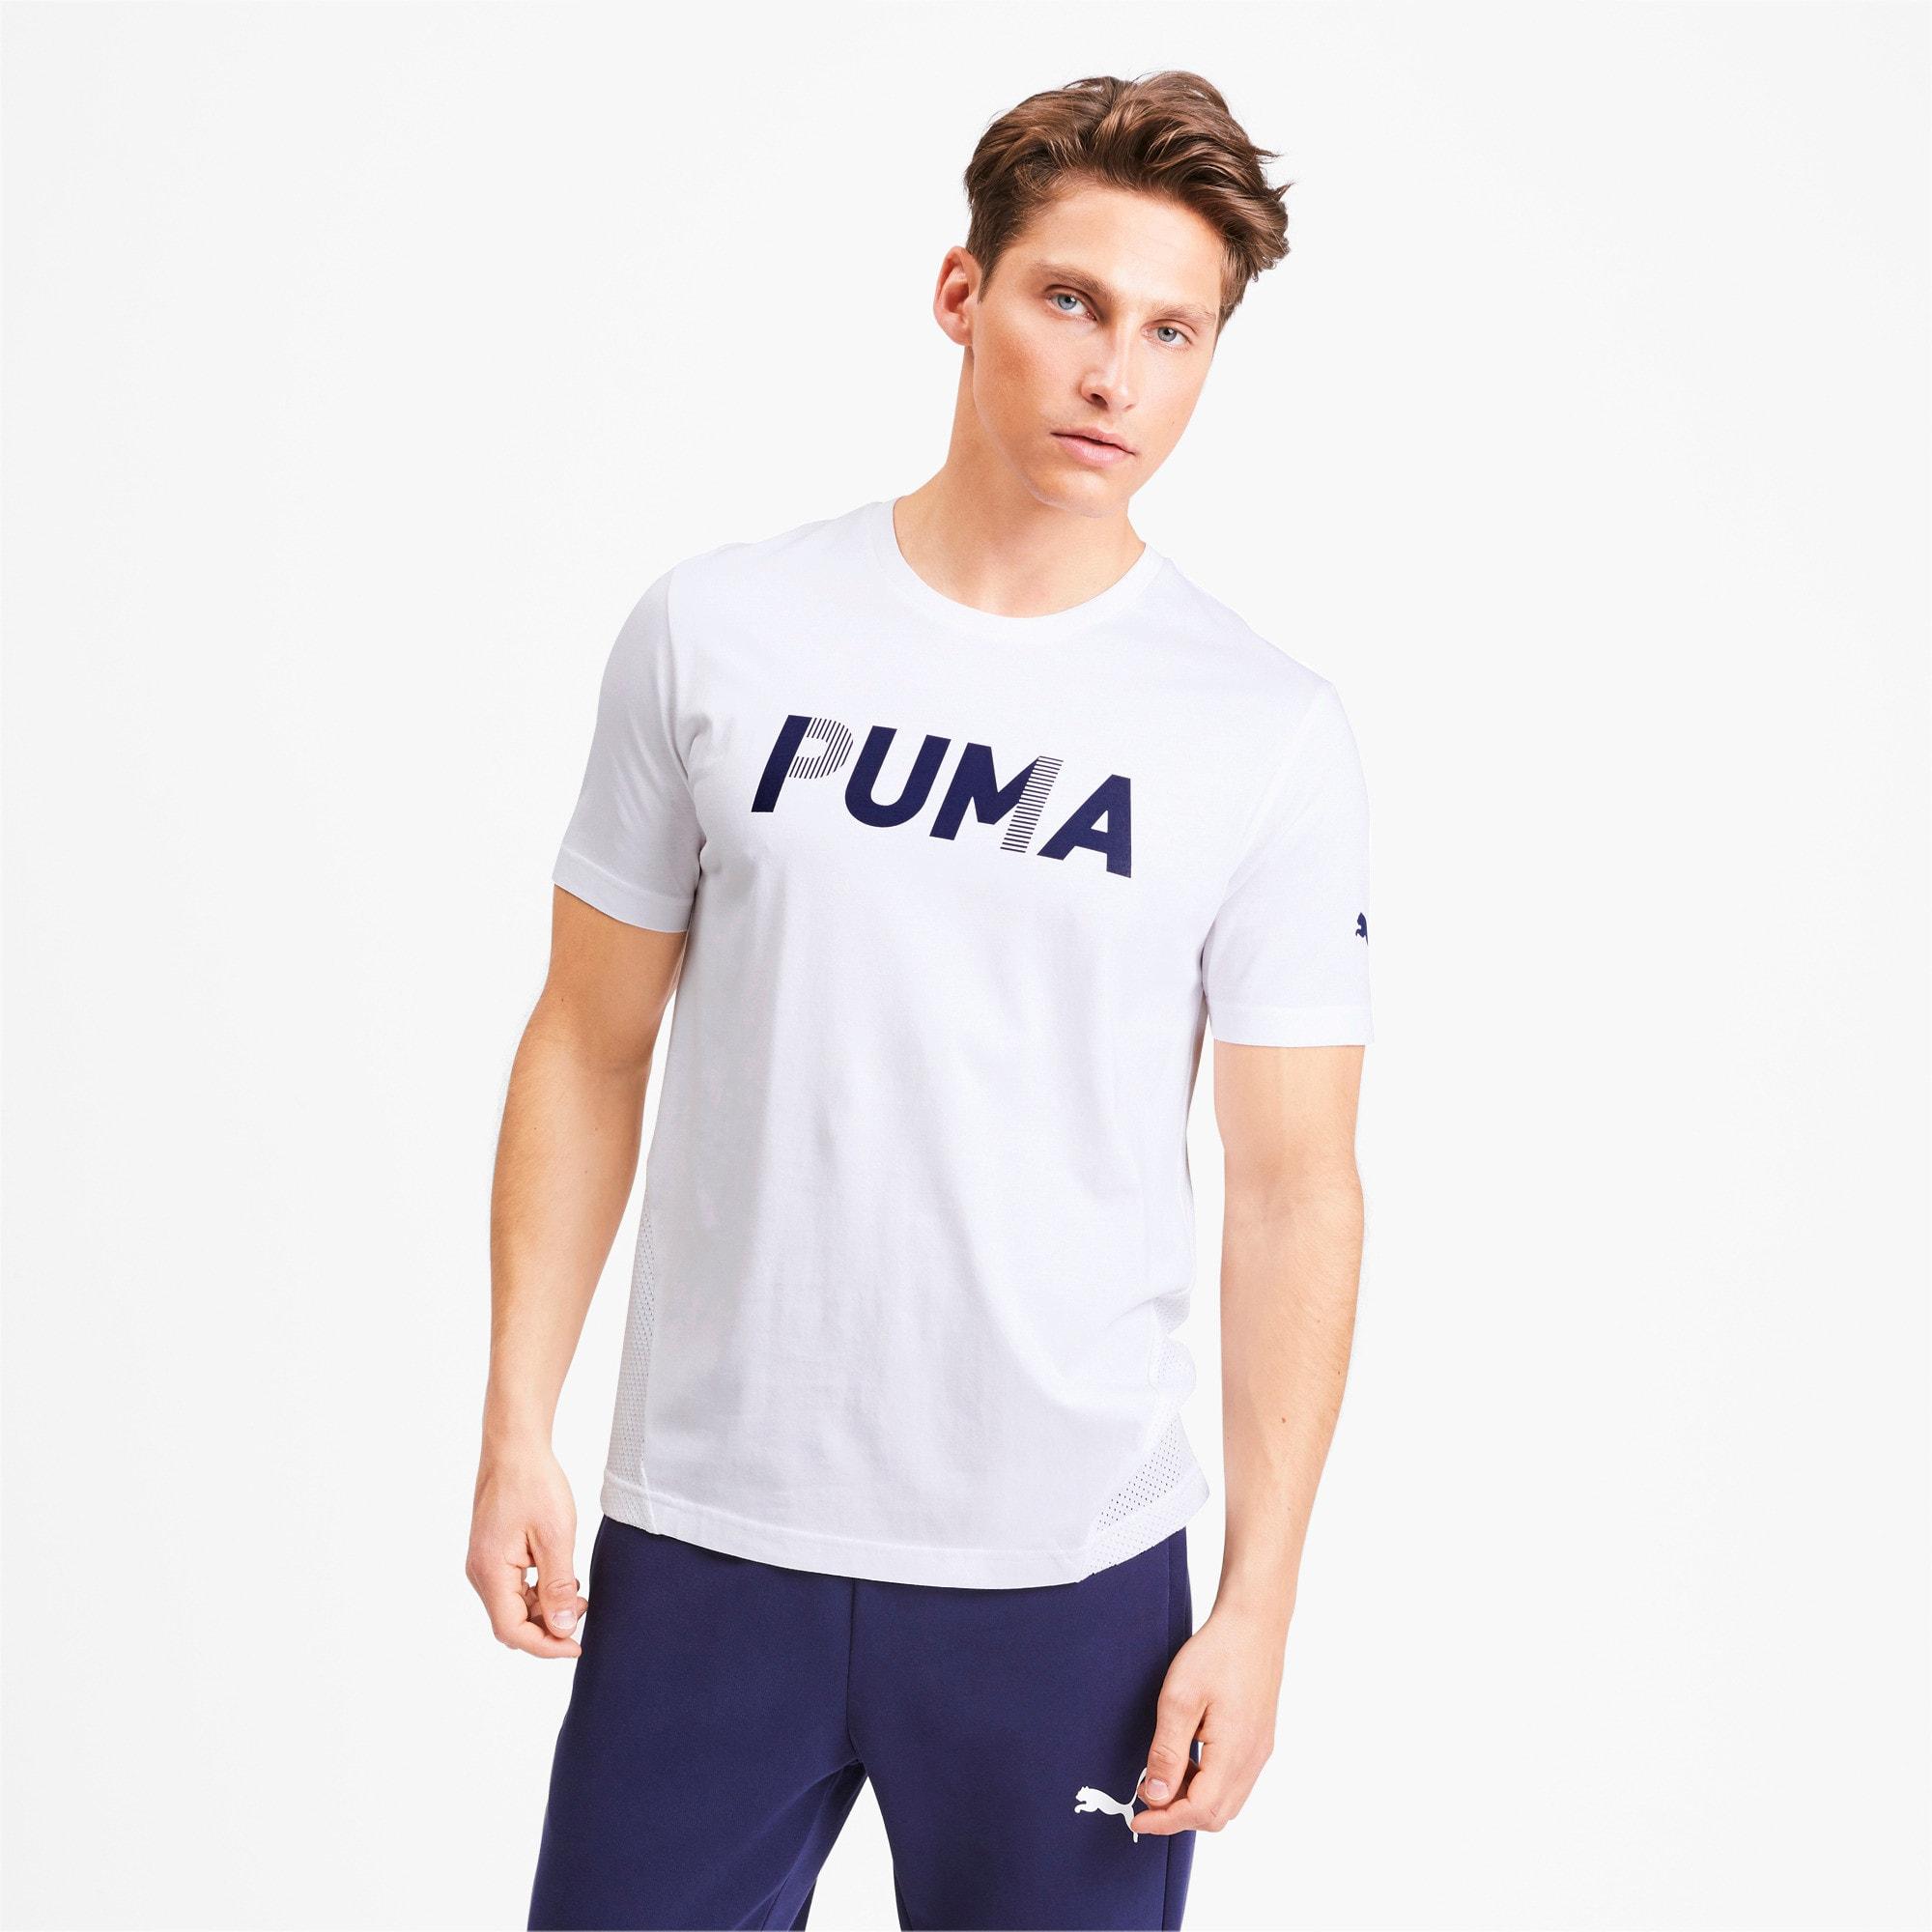 Thumbnail 1 of Modern Sports Advanced Men's Tee, Puma White, medium-IND